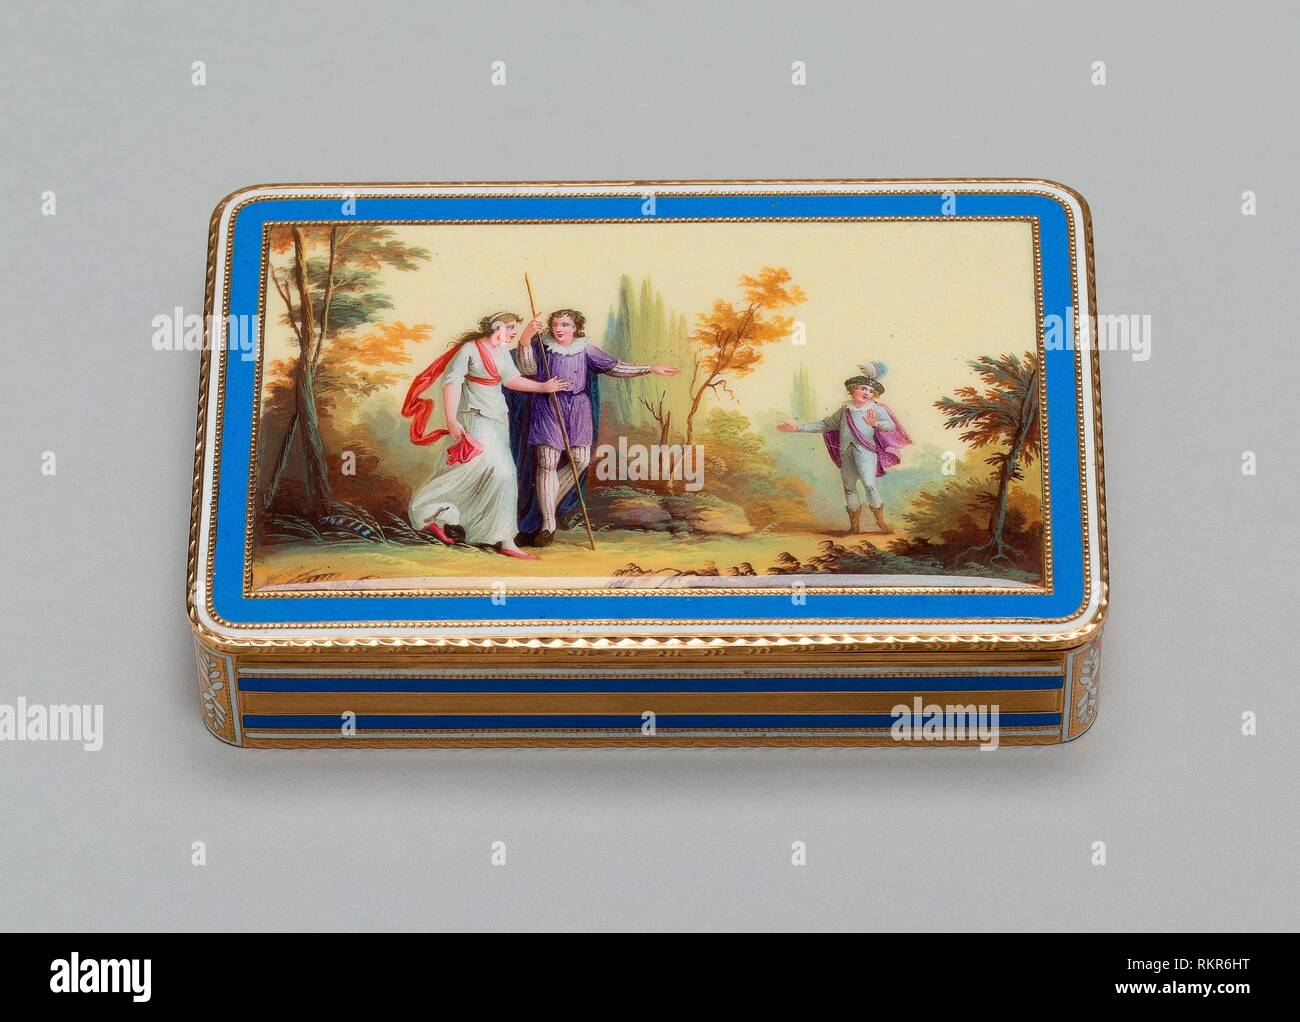 Snuff Box - About 1800/10 - Possibly Switzerland - Origin: Switzerland, Date: 1795-1815, Medium: Gold and enamel, Dimensions: 1.8 x 8.7 x 5.7 cm Stock Photo